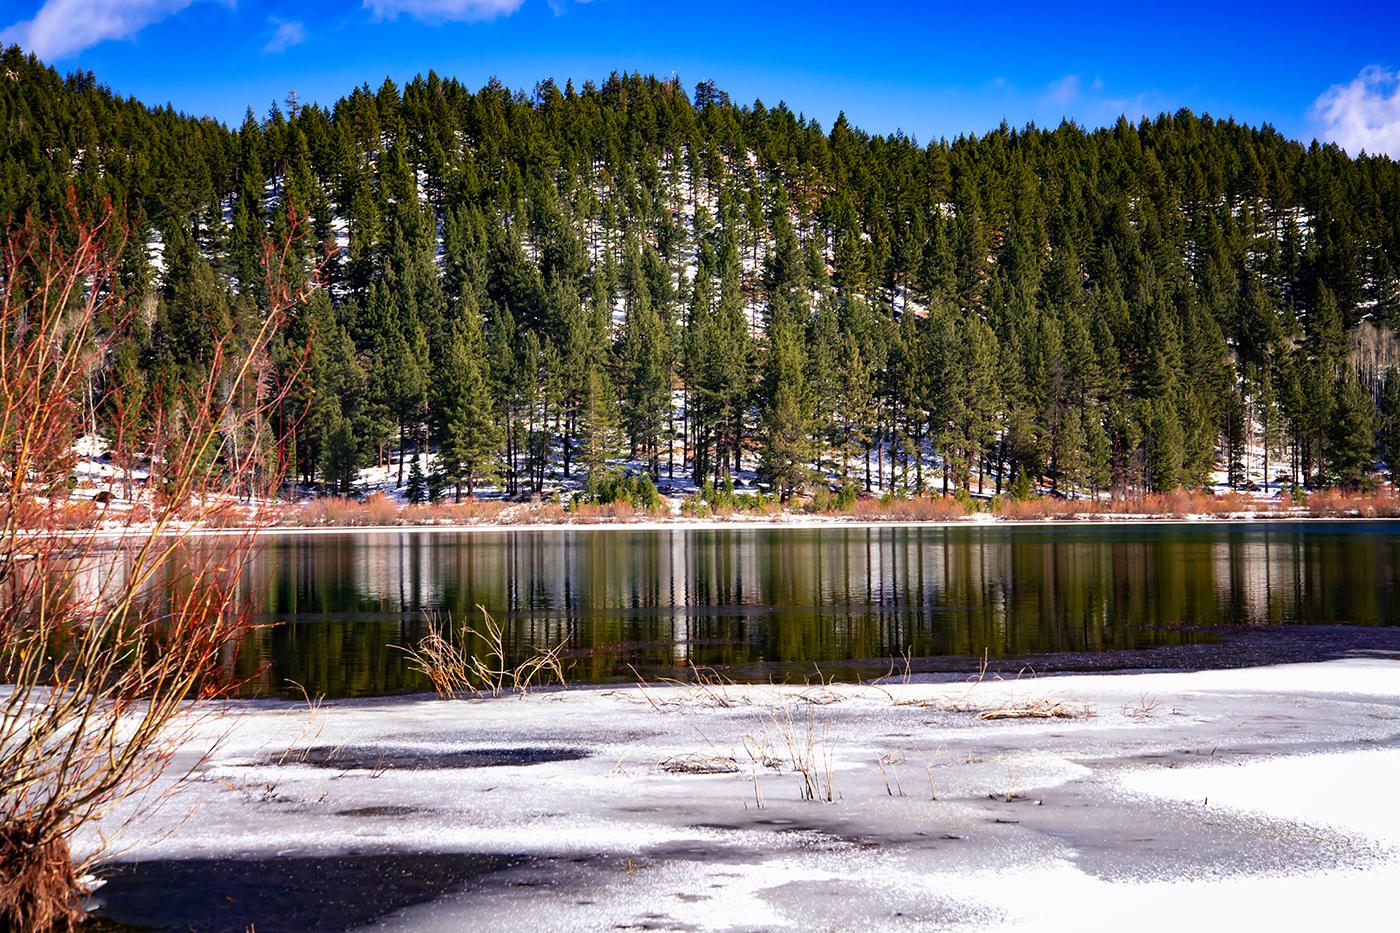 Spooner Lake Reflection